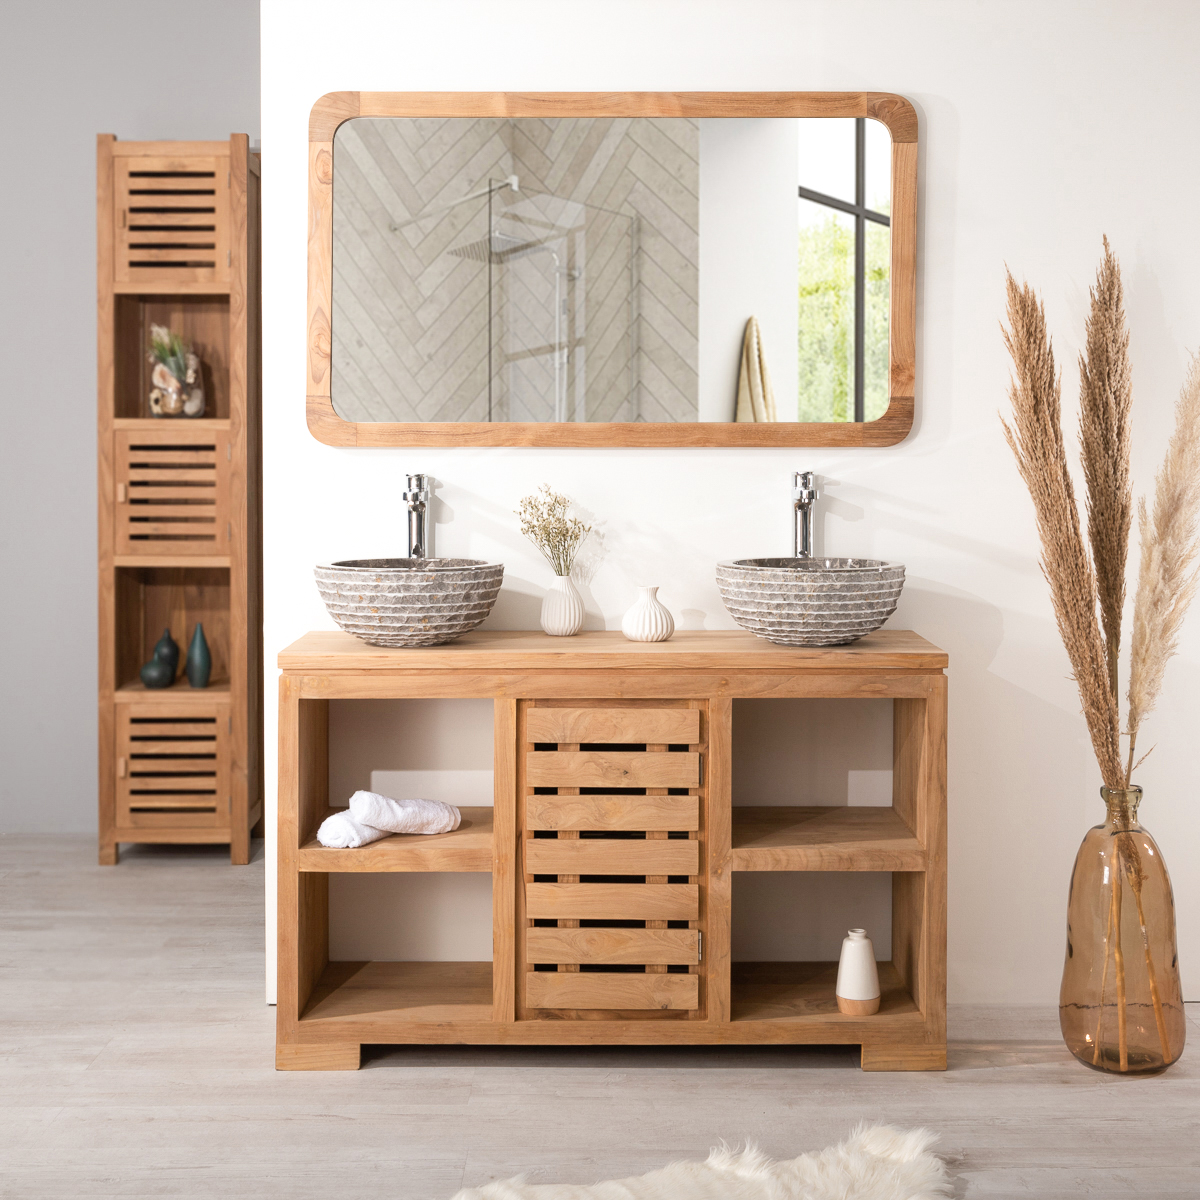 miroir teck grand miroir salle de bain r tro 120x70 cm. Black Bedroom Furniture Sets. Home Design Ideas